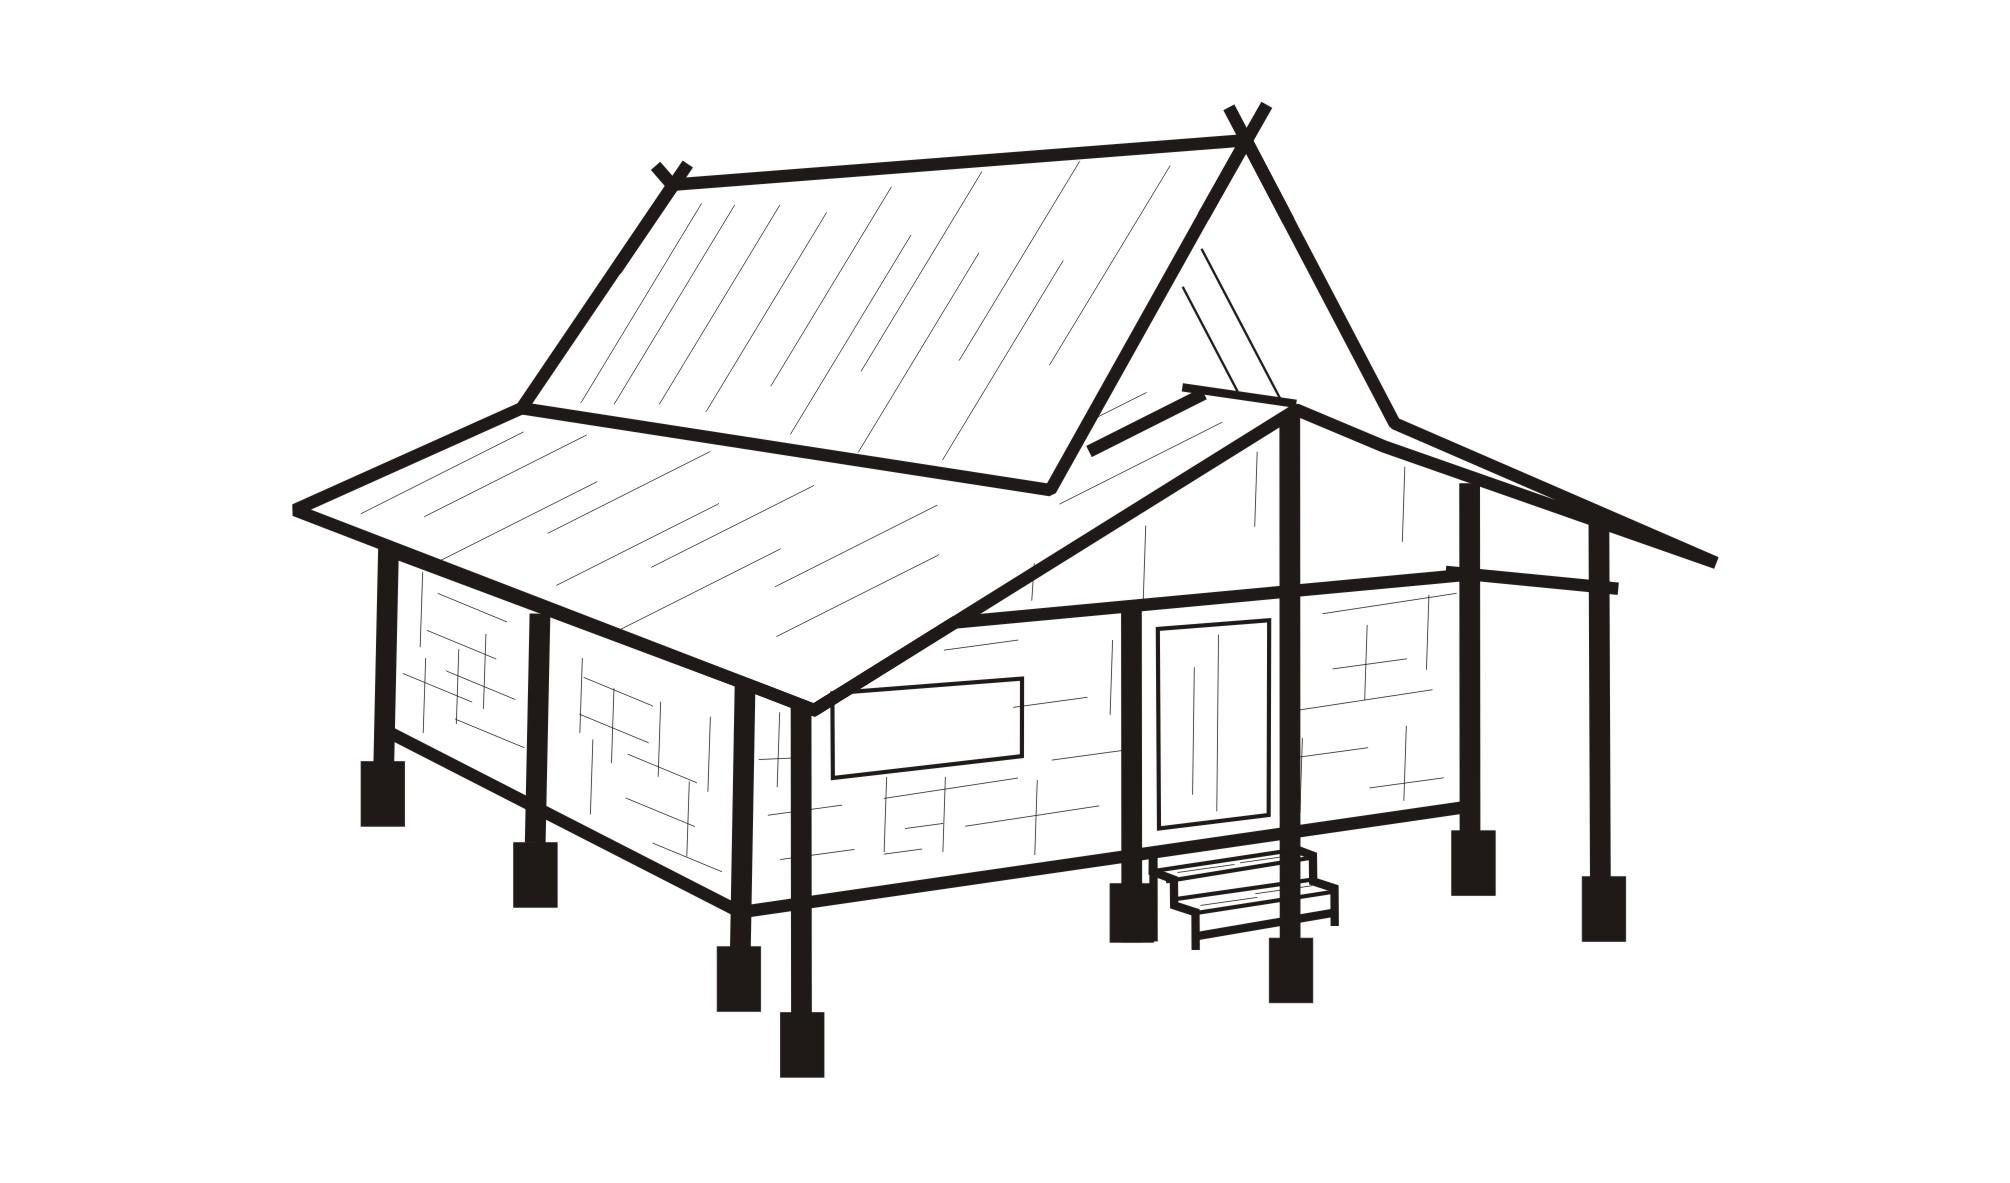 Contoh Gambar Mewarnai Rumah Panggung Kataucap